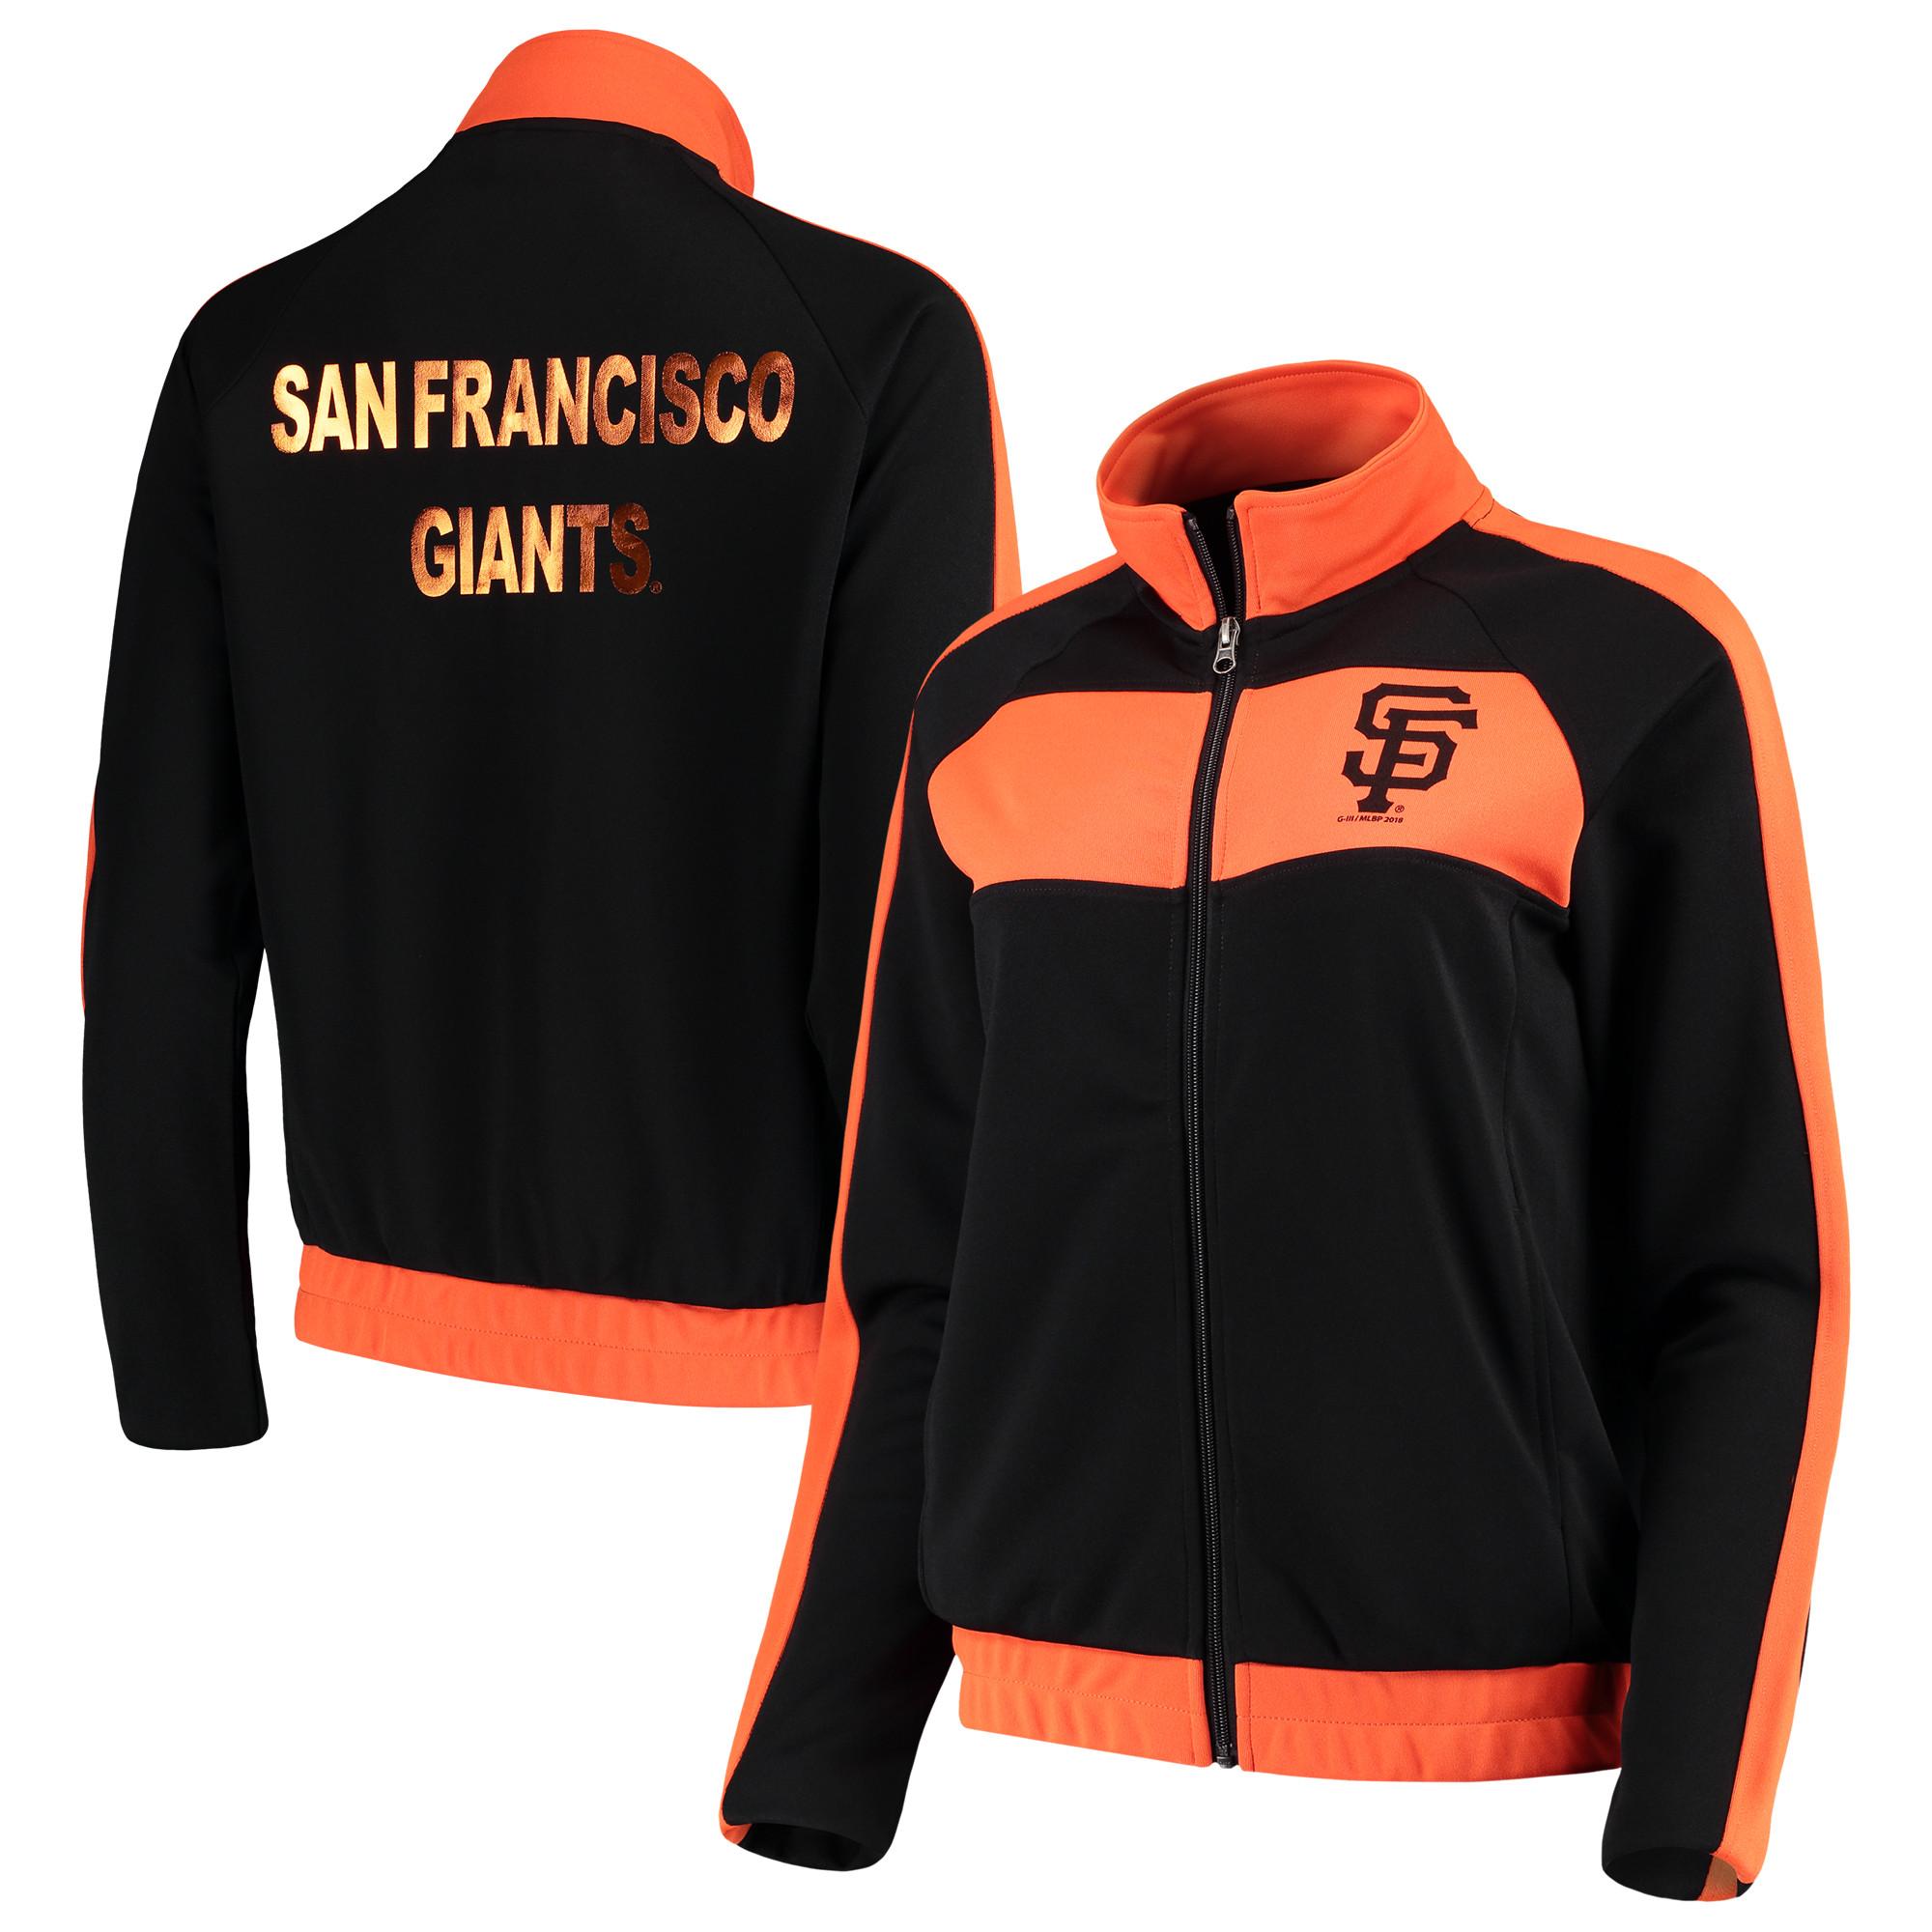 San Francisco Giants G-III 4Her by Carl Banks Women's Punt Track Jacket - Black/Orange